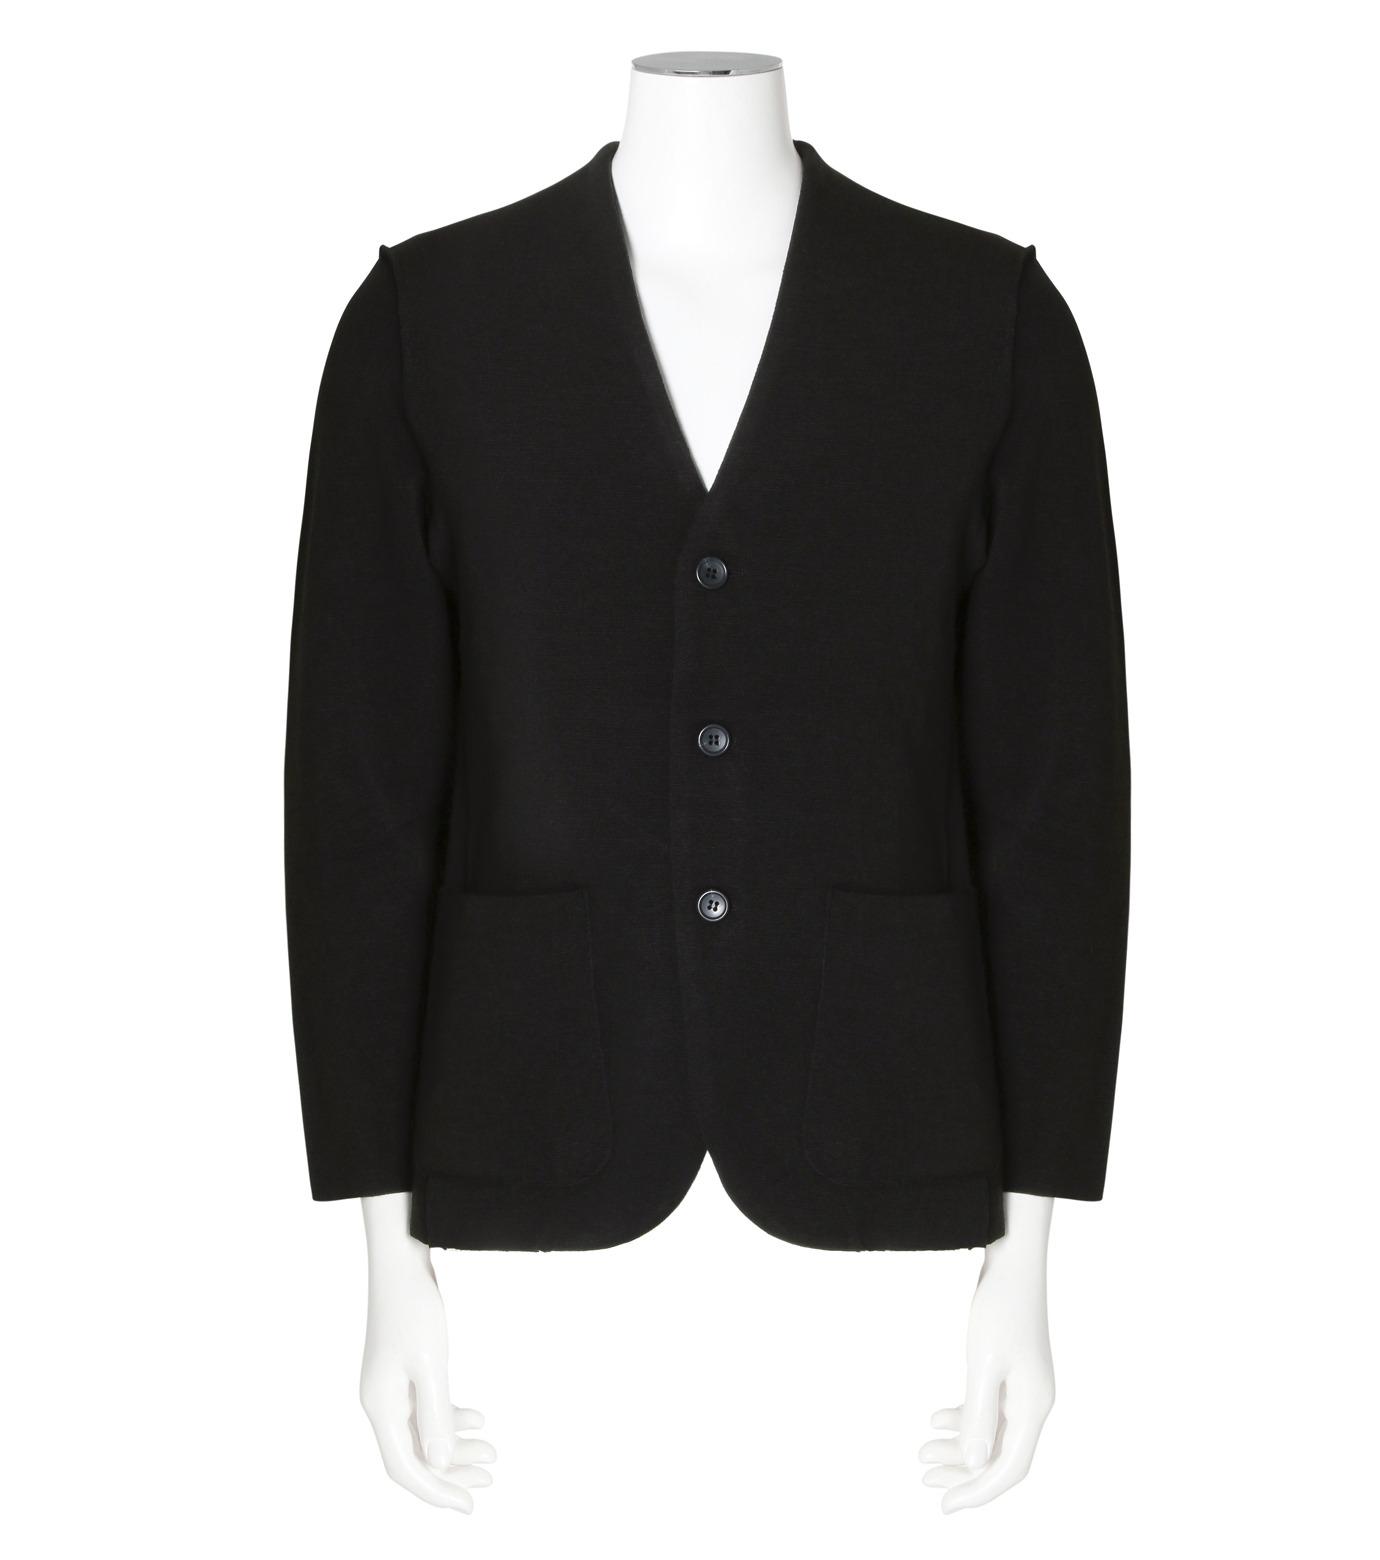 RAINMAKER(レインメーカー)のrib nocollar jacket-BLACK(ジャケット/jacket)-RM162-006-13 拡大詳細画像1